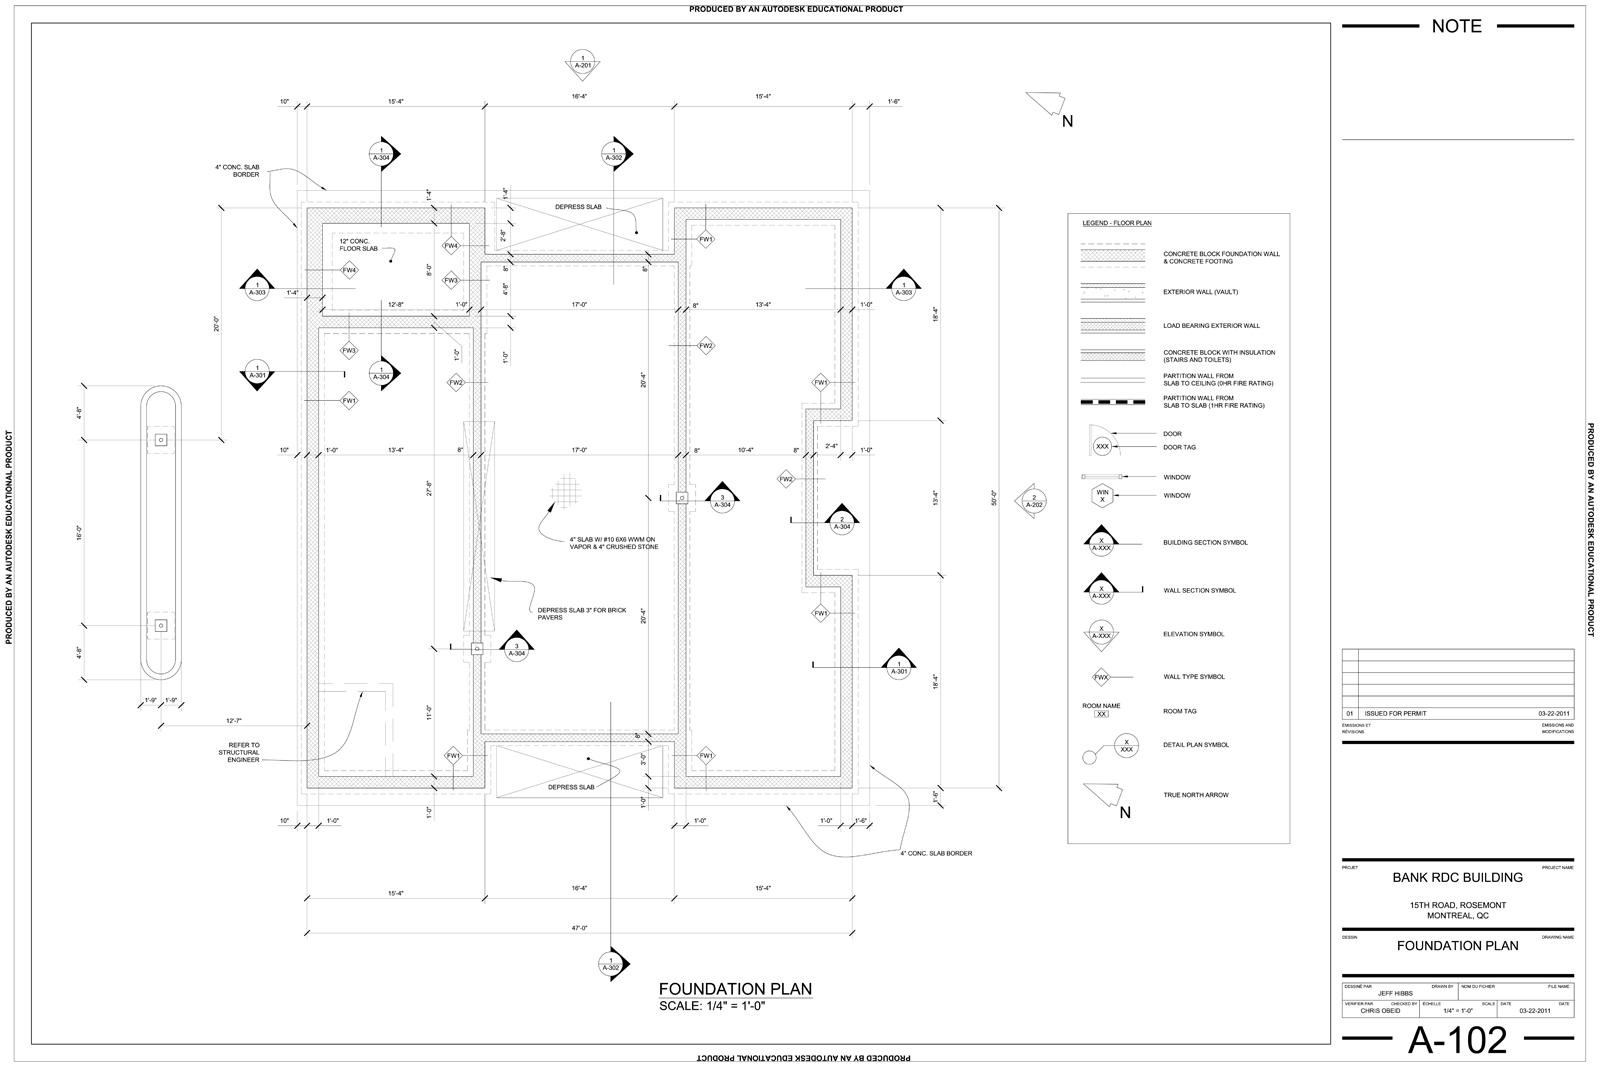 Jeff hibbs drafting portfolio autocad drawings for Foundation plan drawing